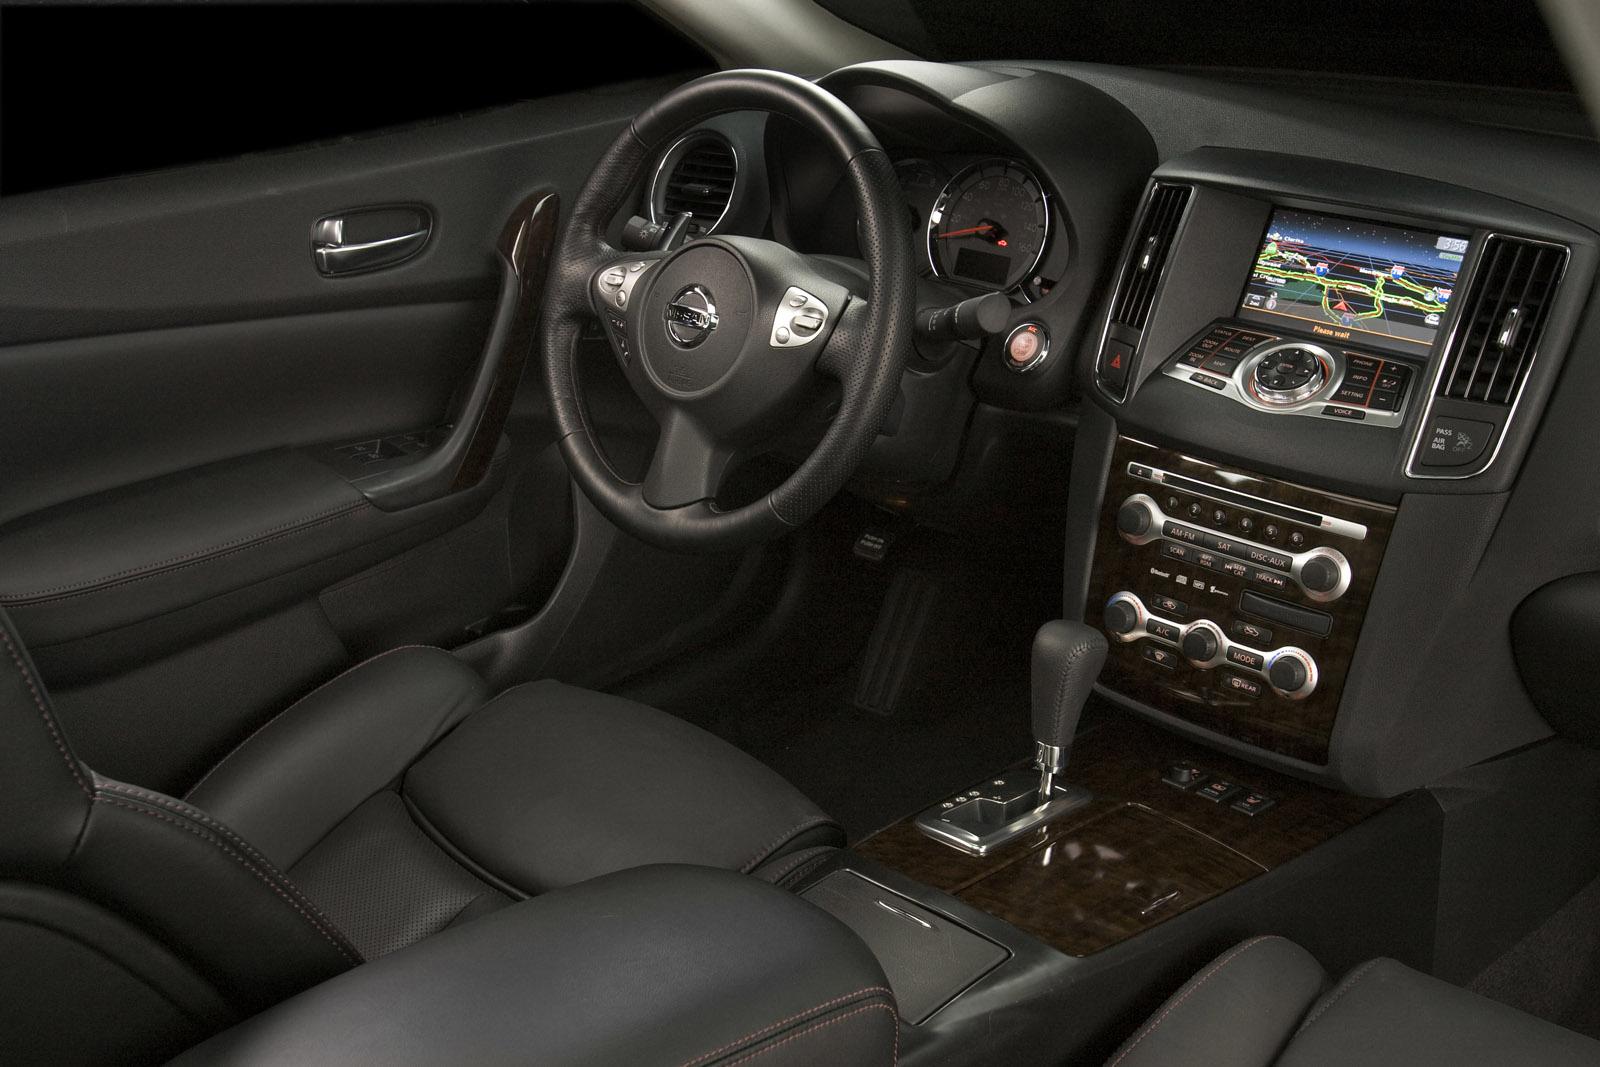 Nissan Maxima 2009 - Picture 15918